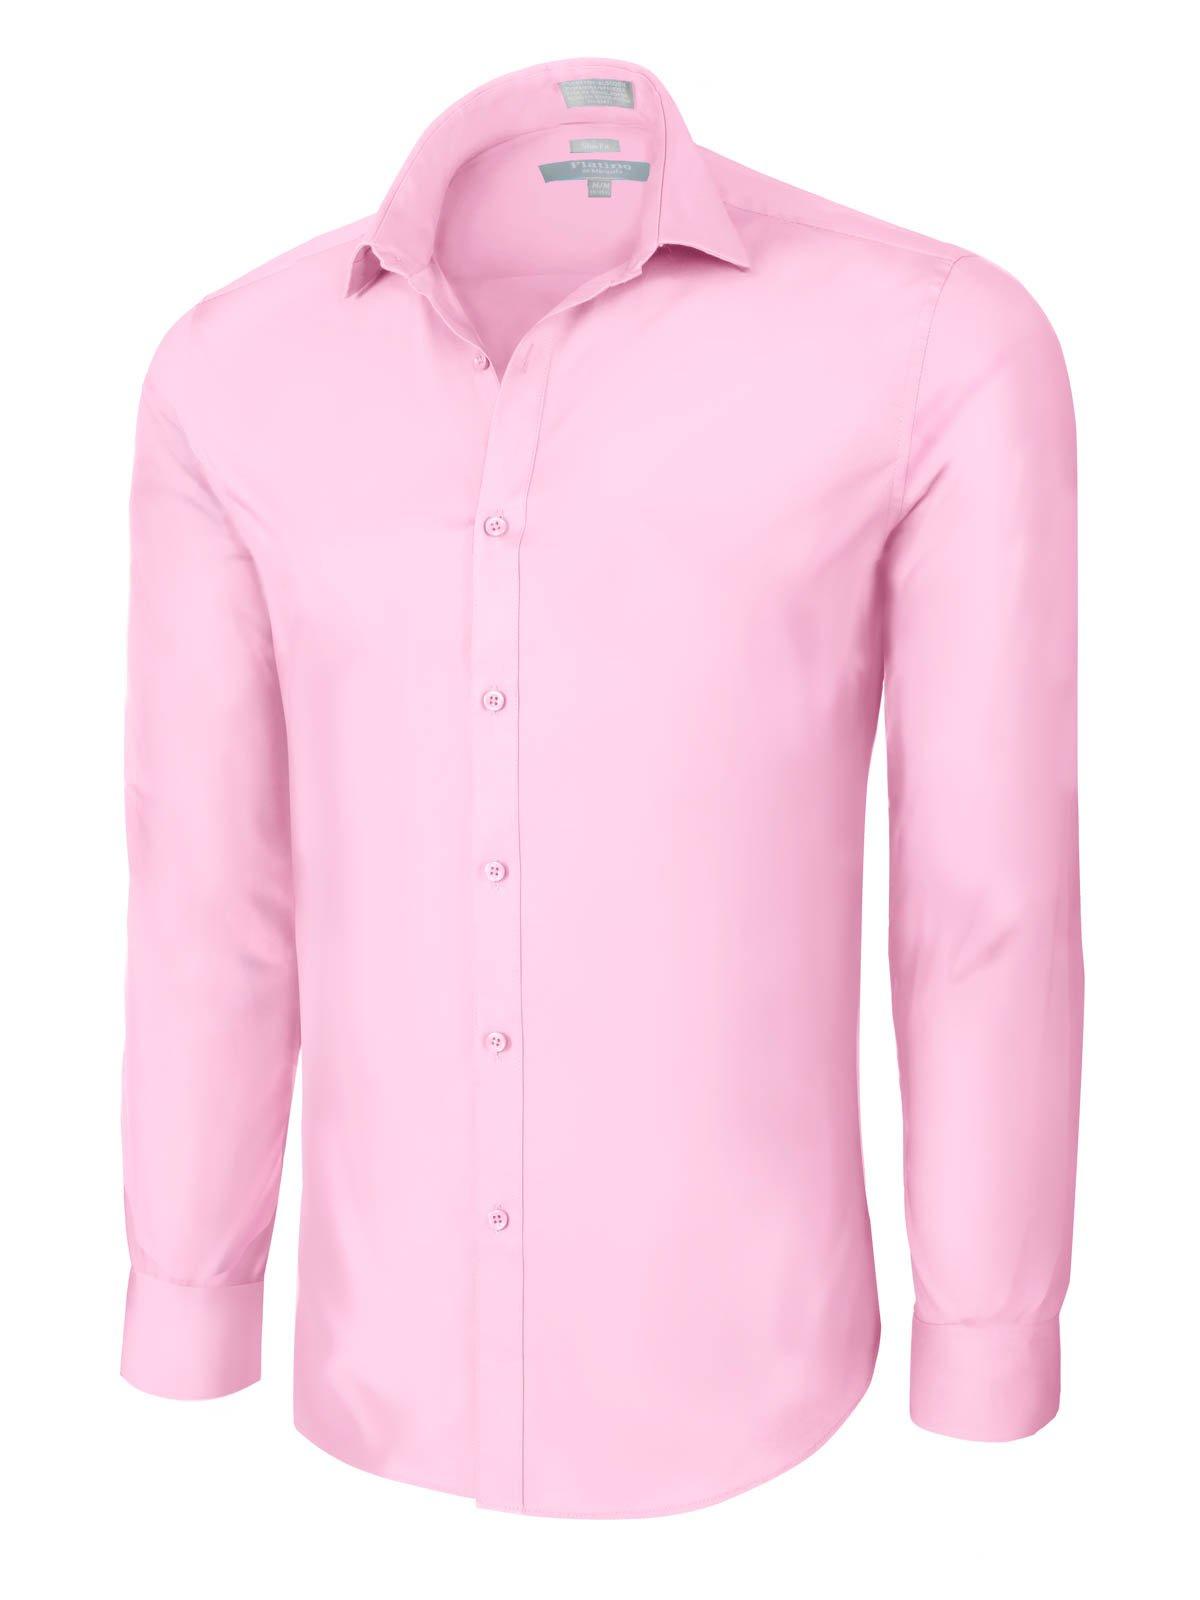 Platino de Marquis Slim Fit Cotton/Spandex Dress Shirt - Pink Small (14-14.5) 32/33 Sleeve